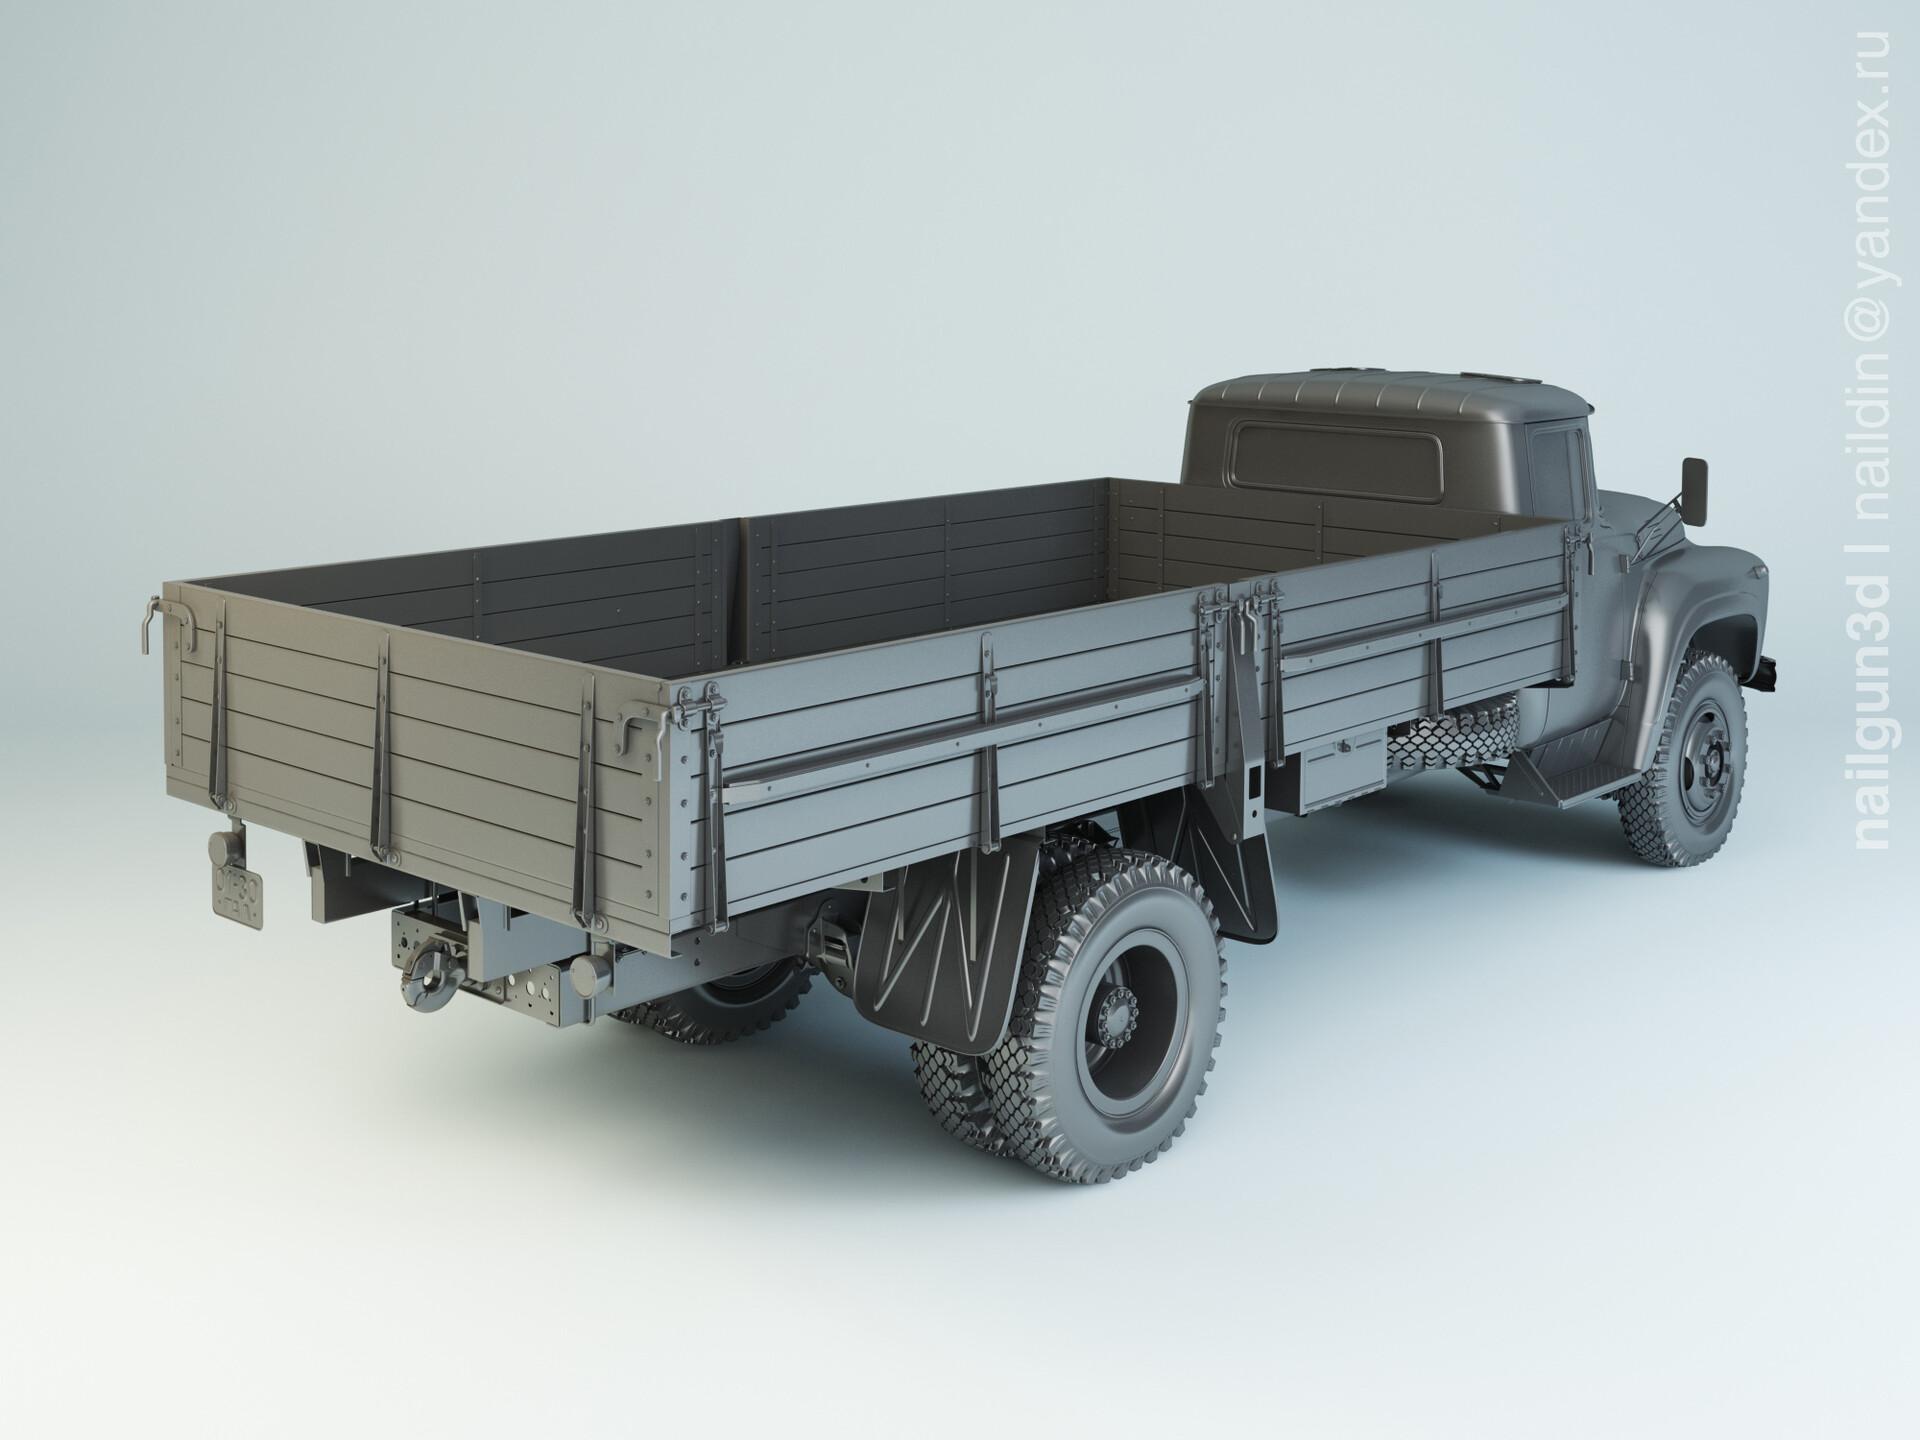 Nail khusnutdinov alg 052 000 zil 130g modelling 1